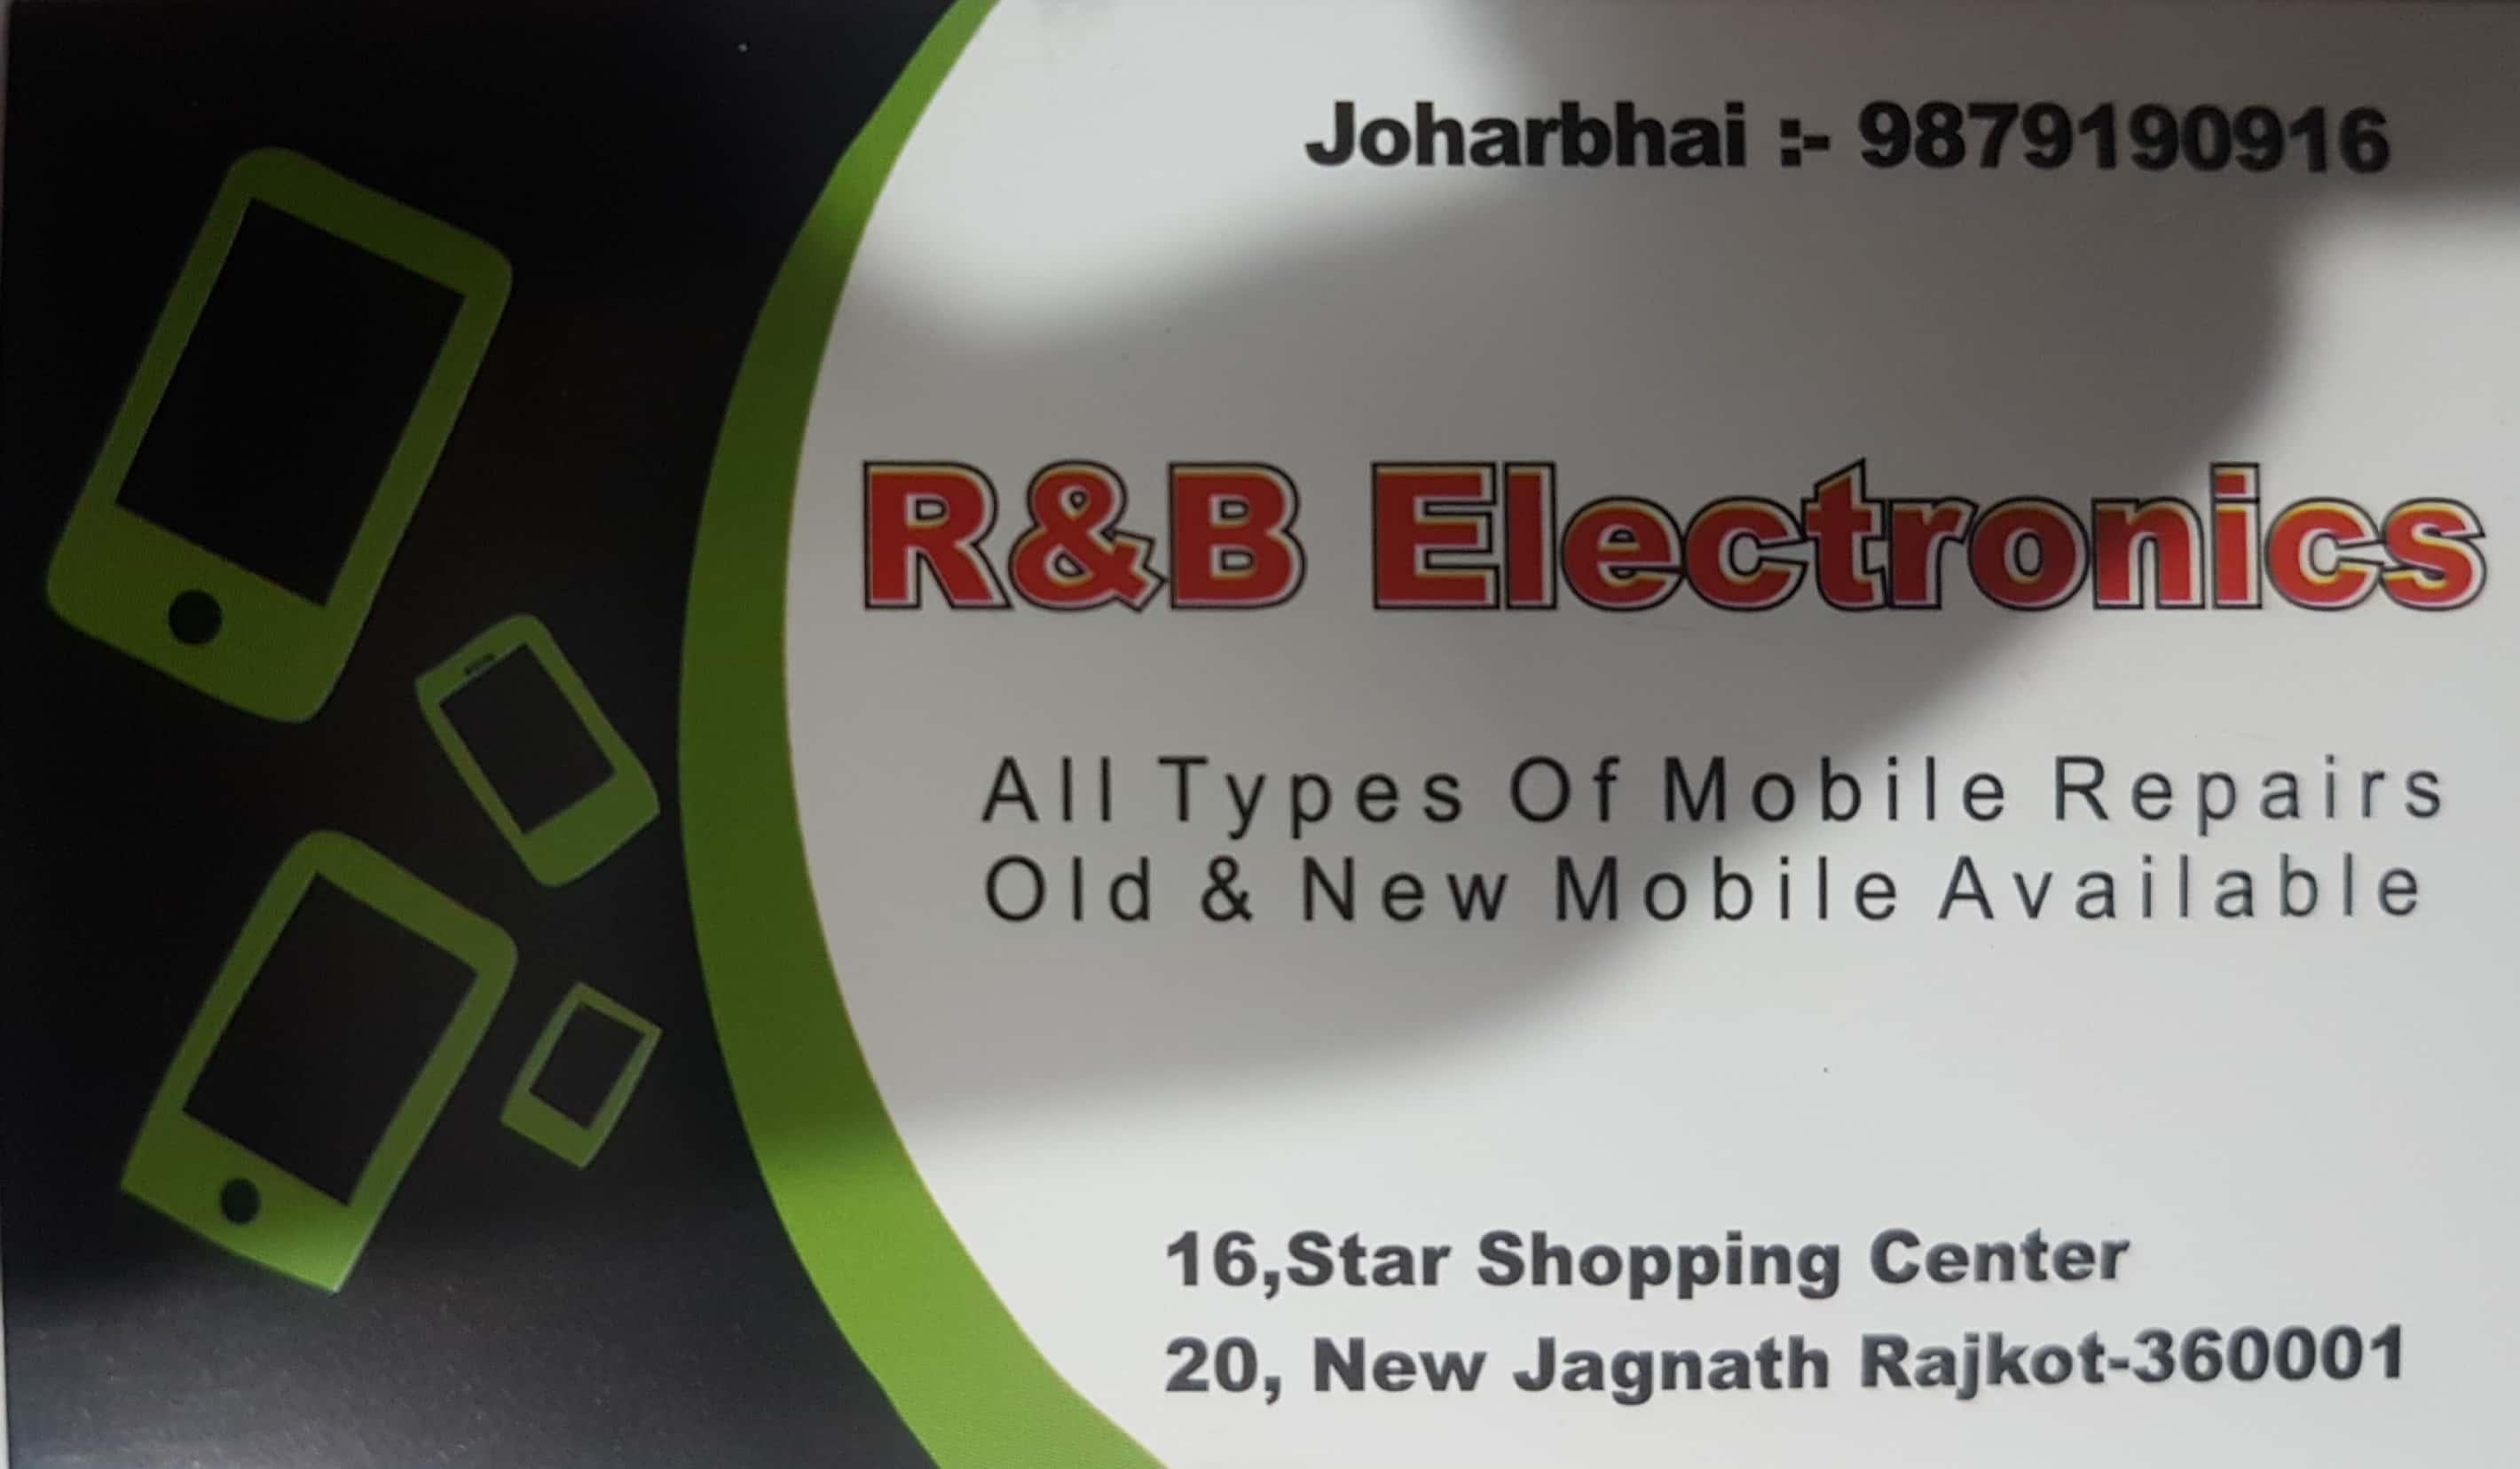 R B ELECTRONICS